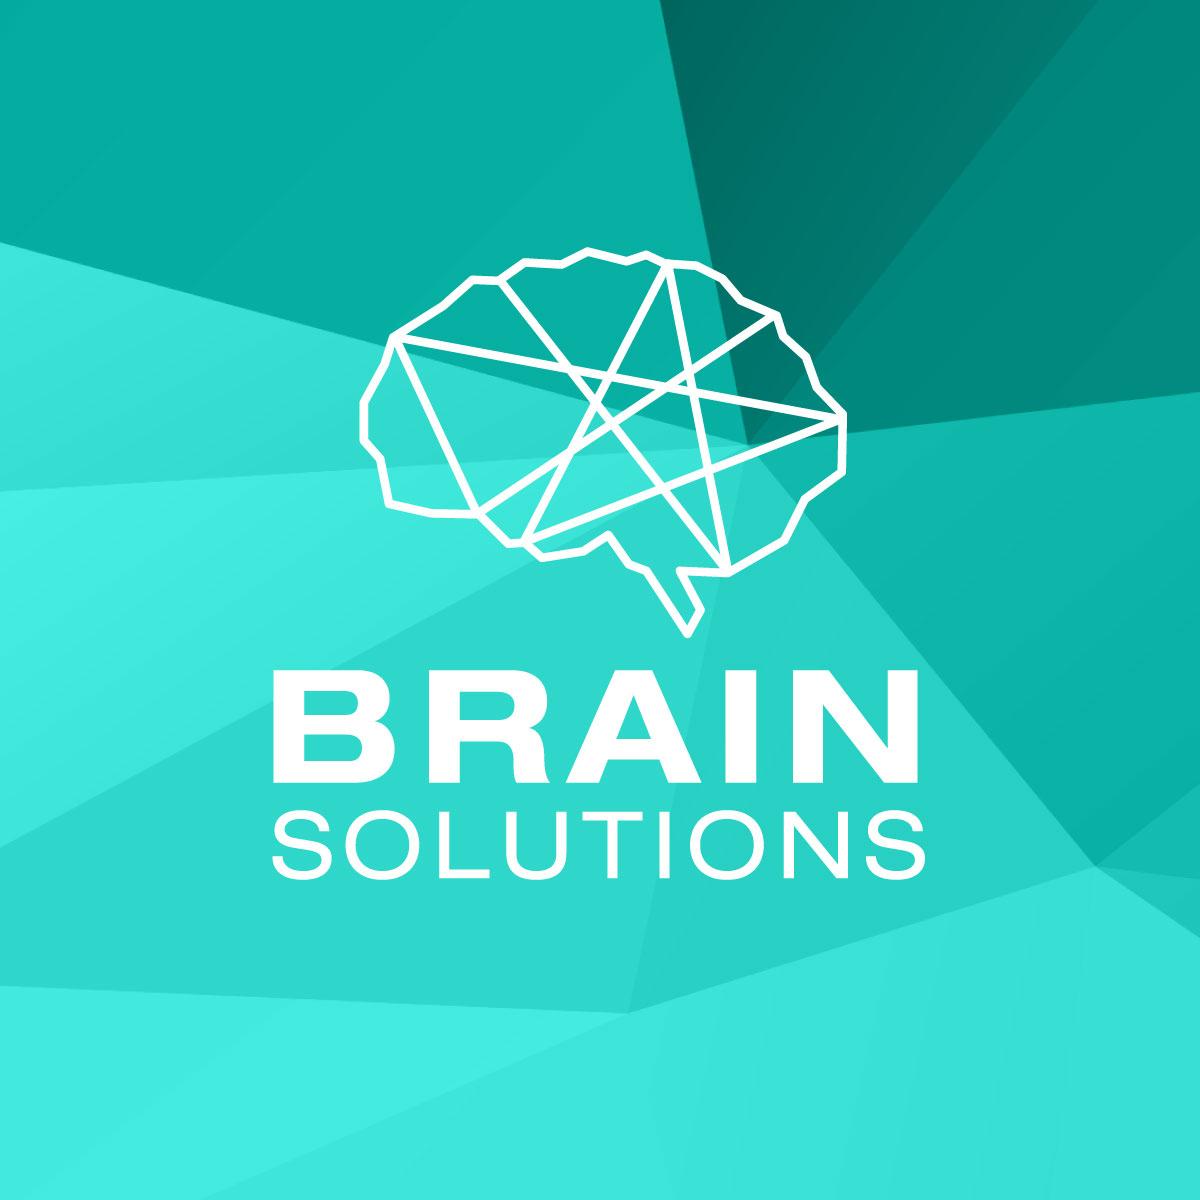 Brain Solutions Visual Identity - Logo